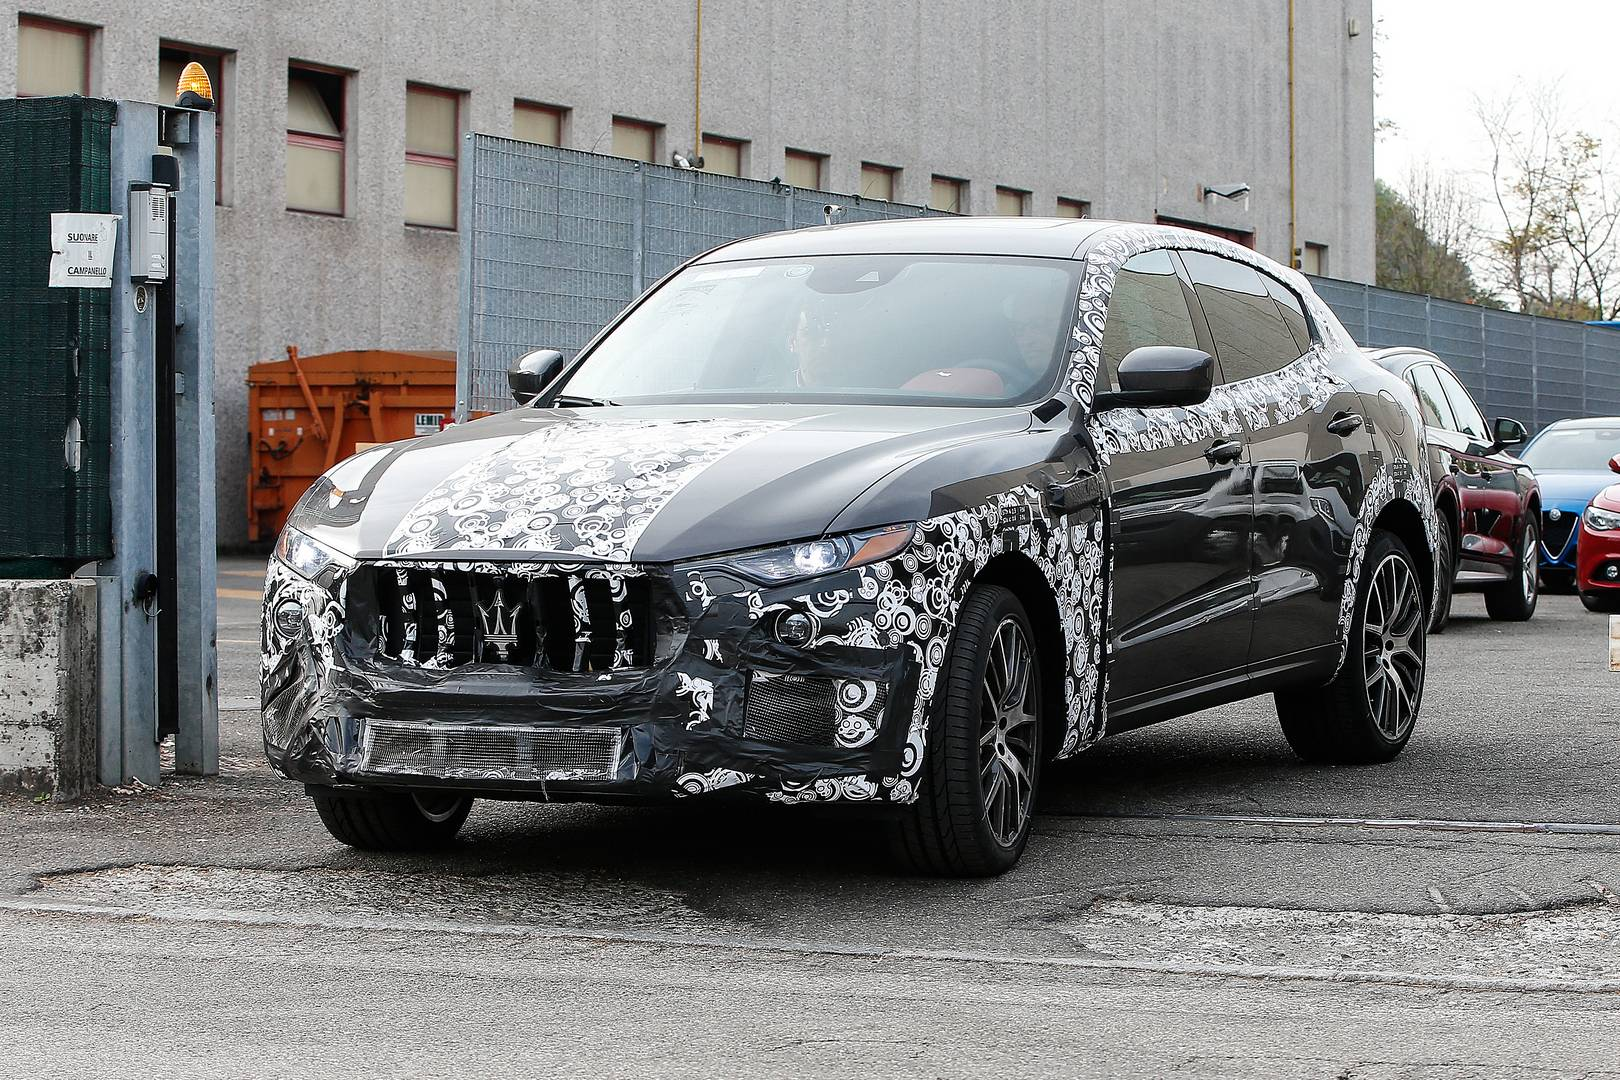 Maserati Levante Gts To Pack 570hp V8 Engine